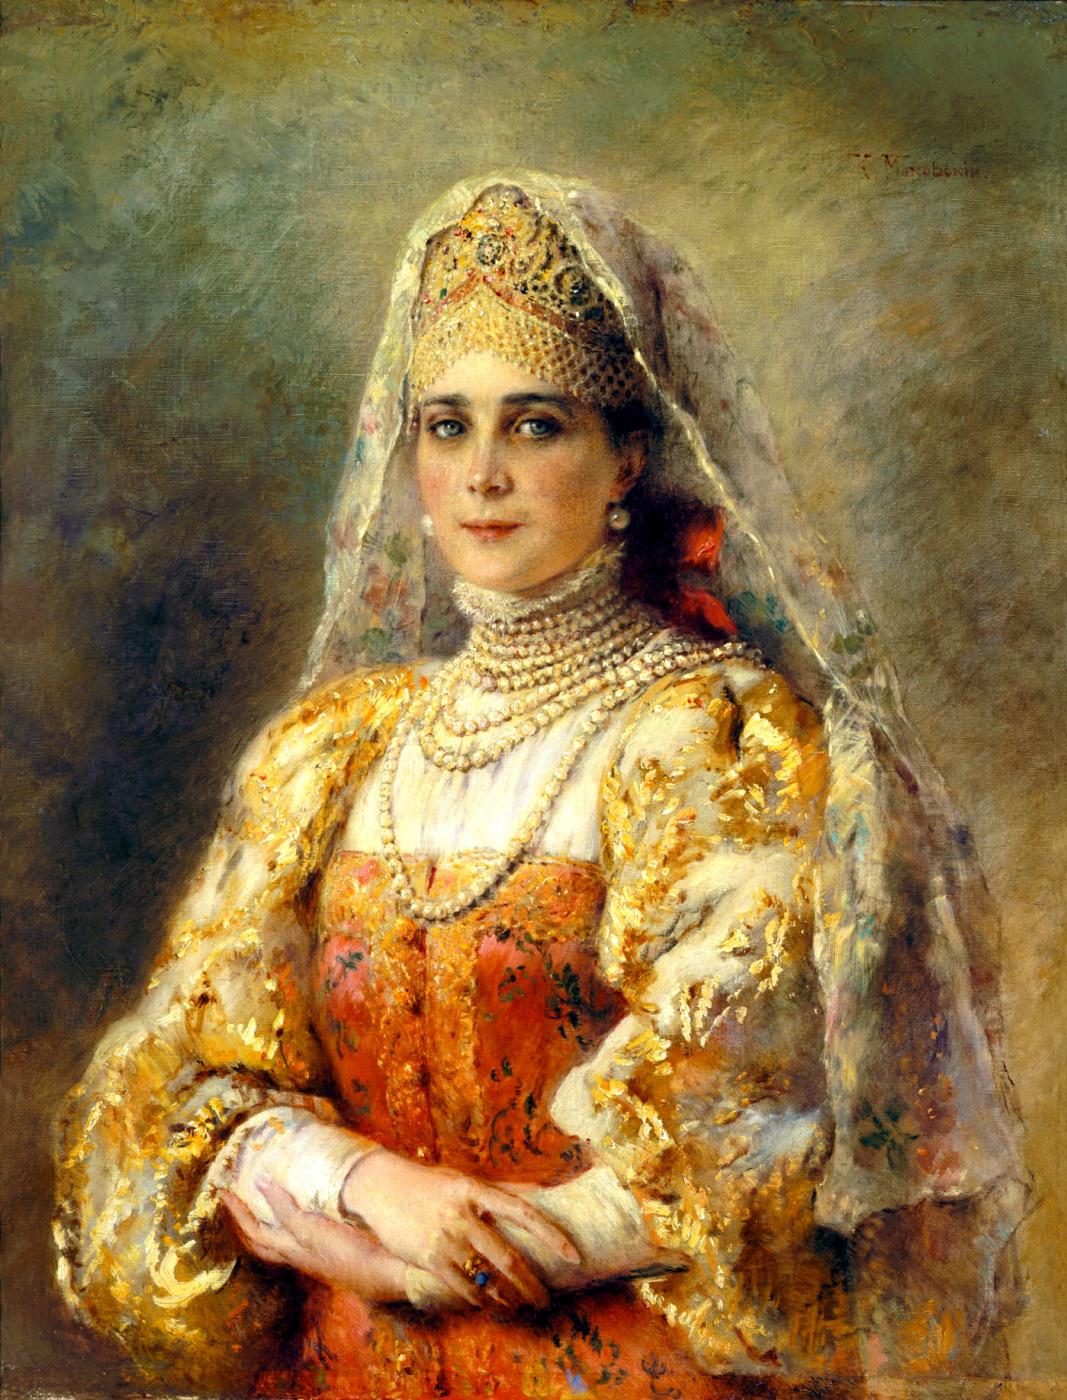 Konstantin Makovsky. Portrait of Princess Zinaida Nikolaevna Yusupova in Russian costume